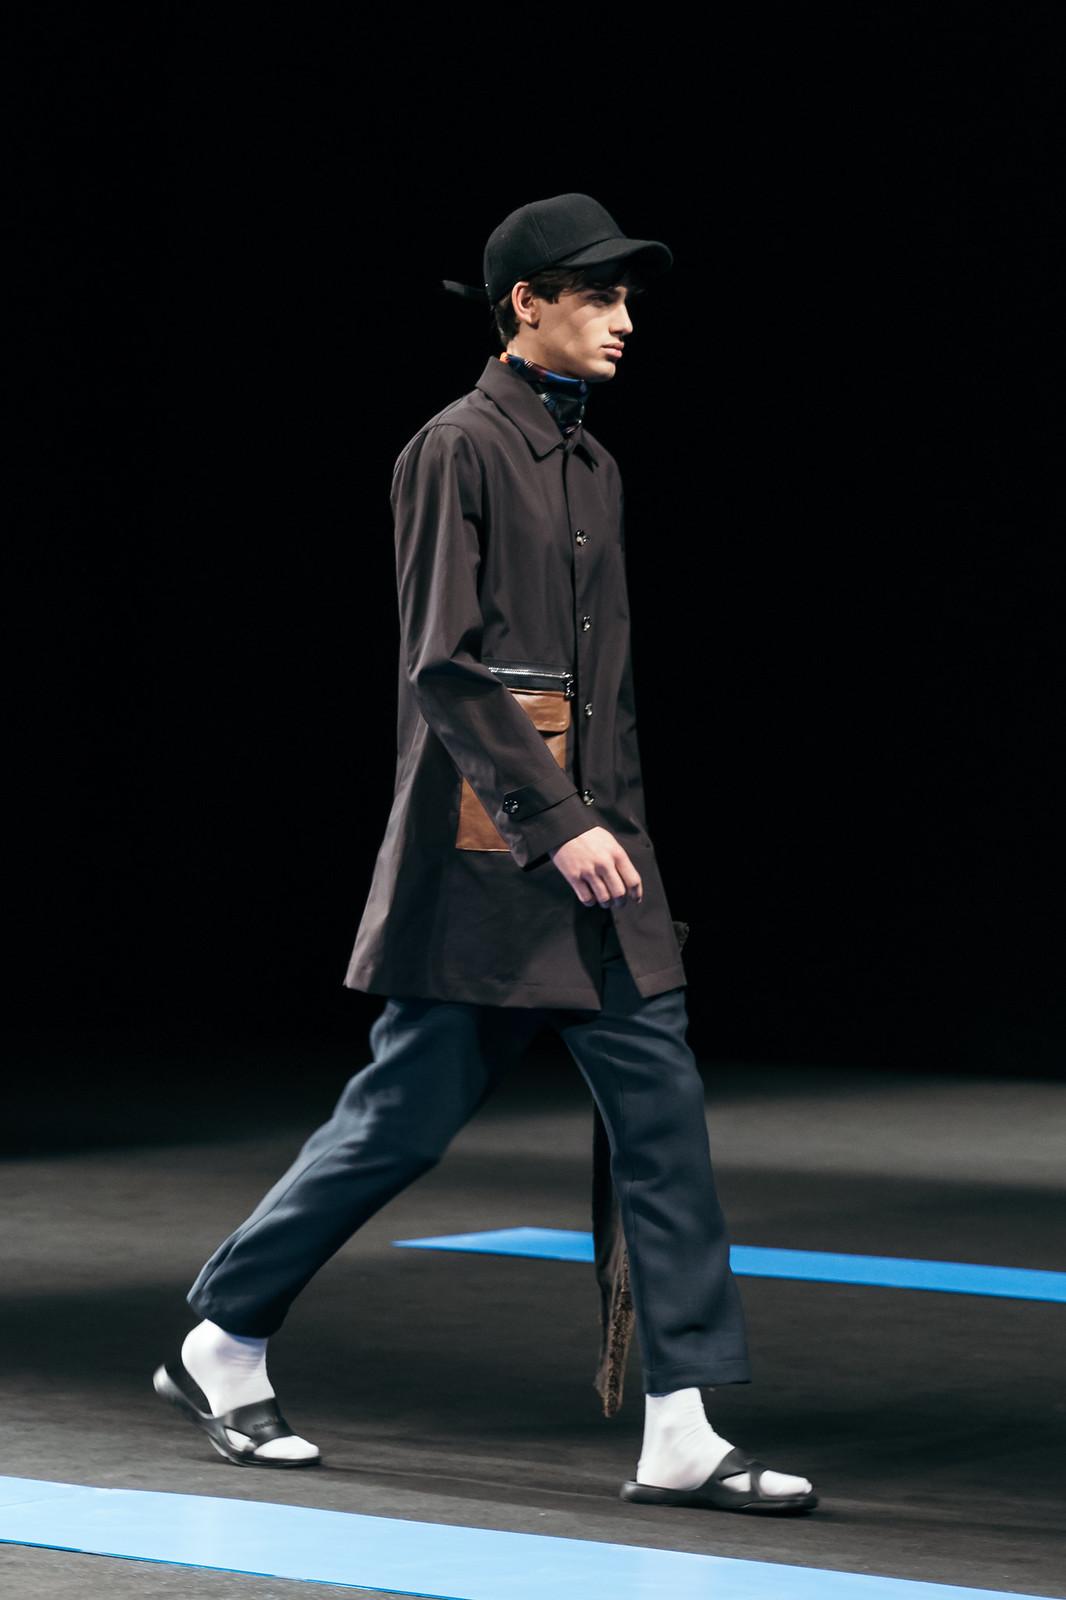 Jessie Chanes - Seams for a desire - 080 Bacelona Fashion #080bcnfasion -46